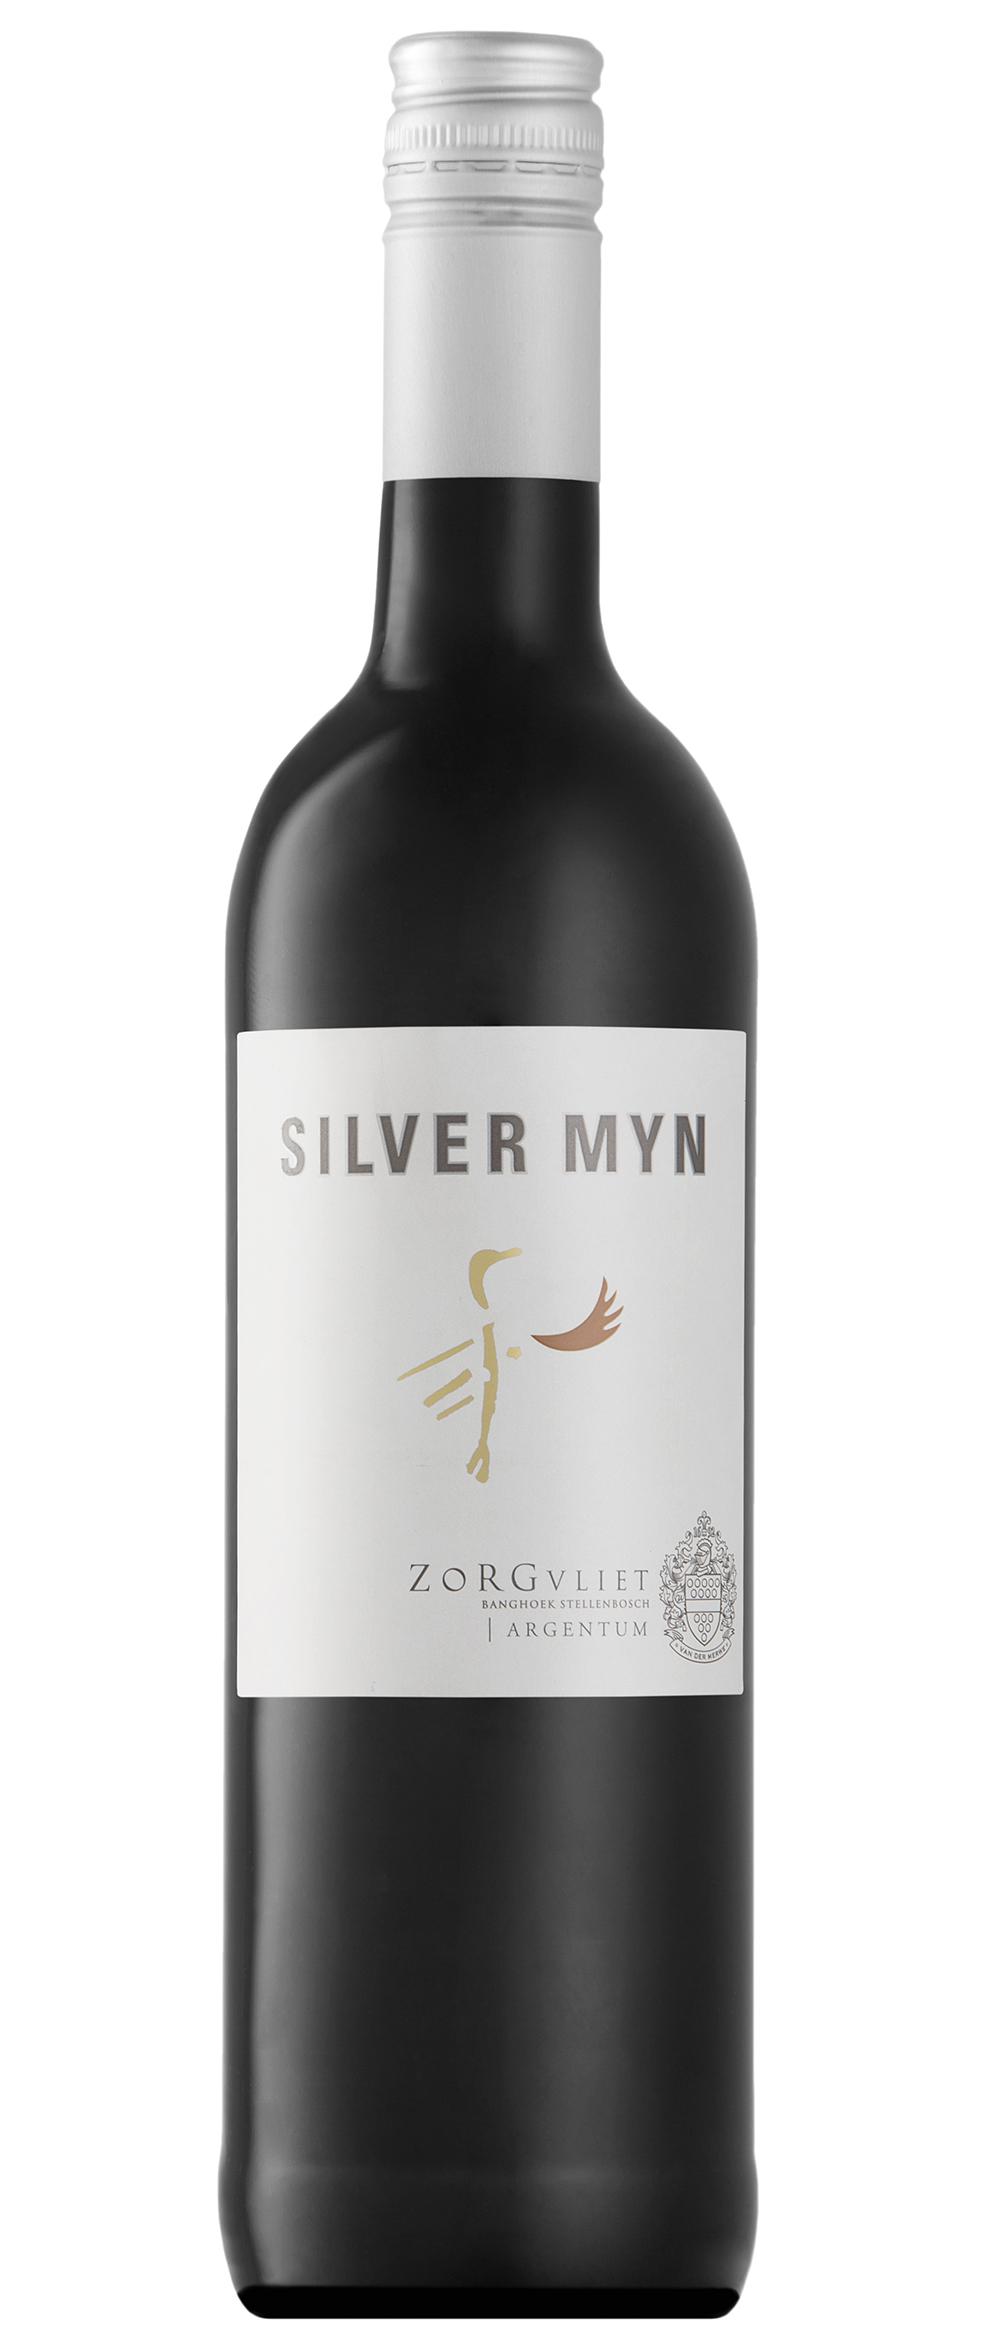 Zorgvliet - Silver Myn - Argentum - 2015 - NV